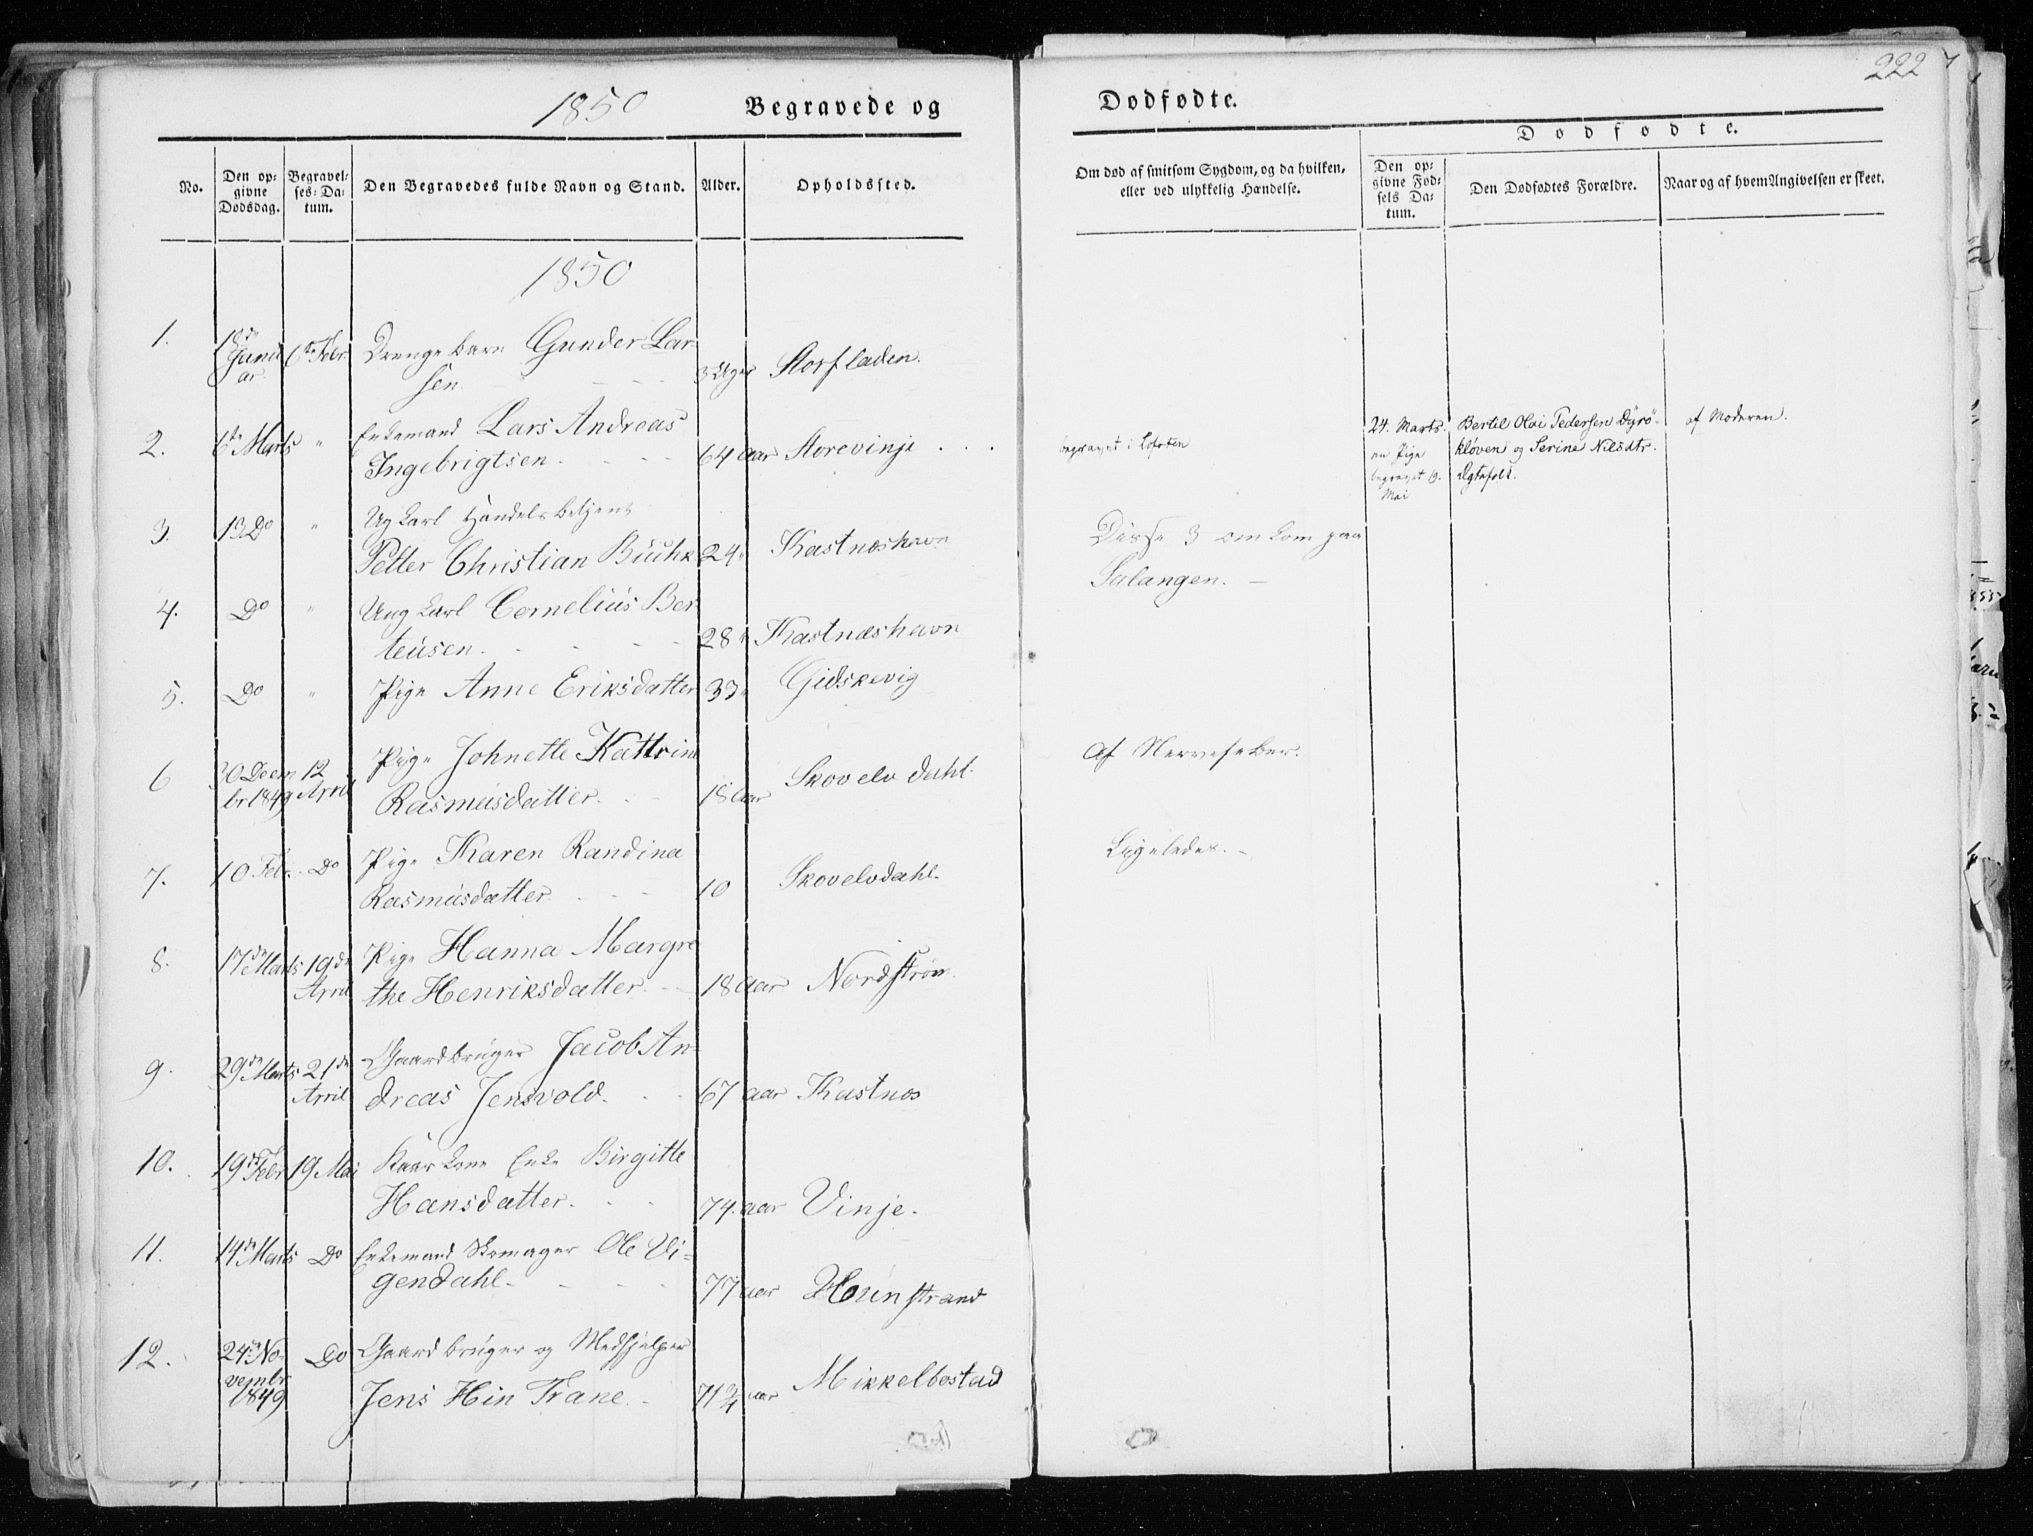 SATØ, Tranøy sokneprestkontor, I/Ia/Iaa/L0006kirke: Ministerialbok nr. 6, 1844-1855, s. 222